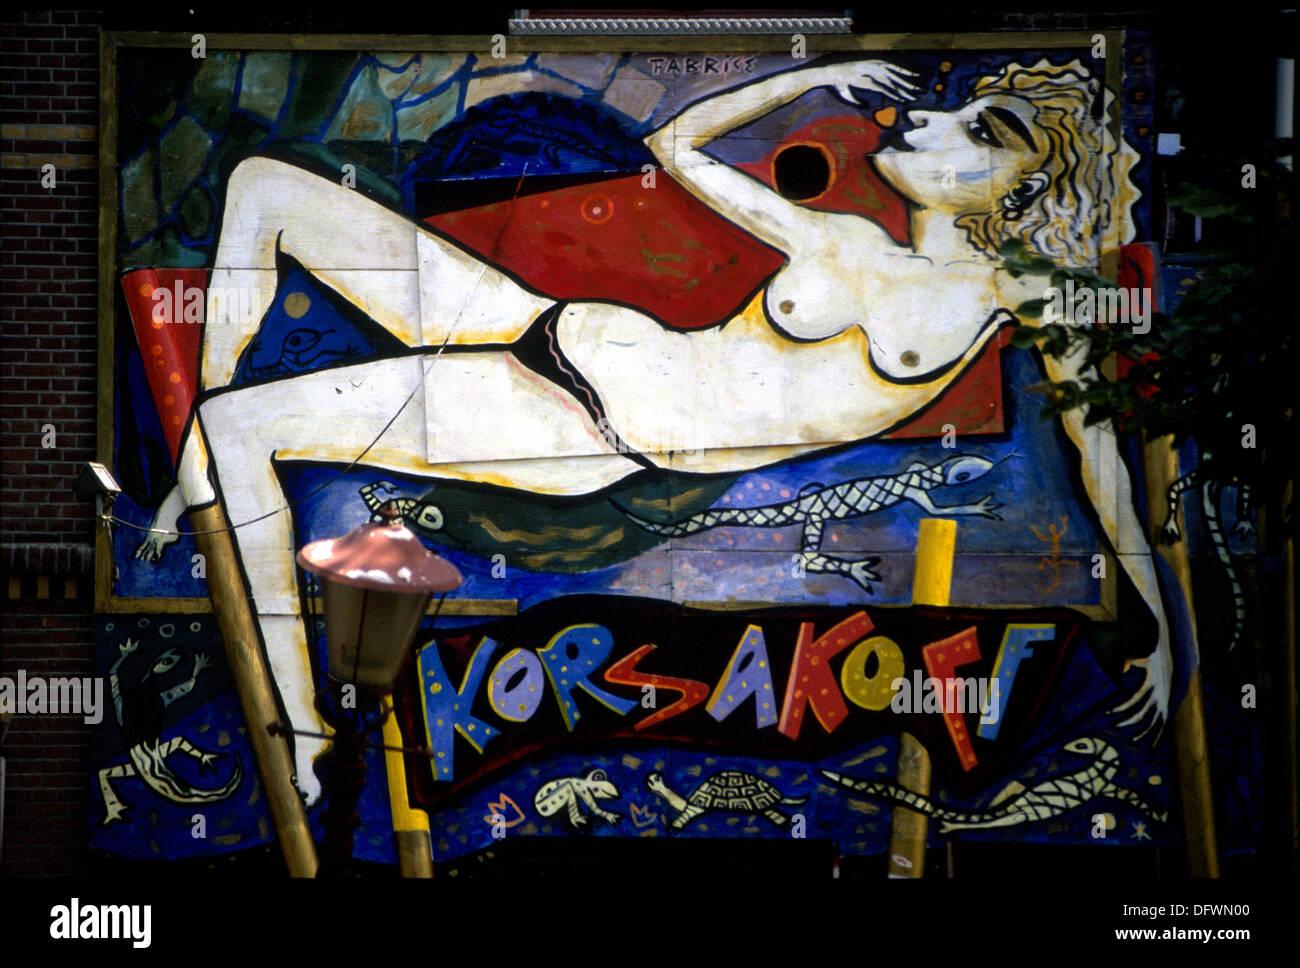 korsakoff-underground-music-club-amsterd